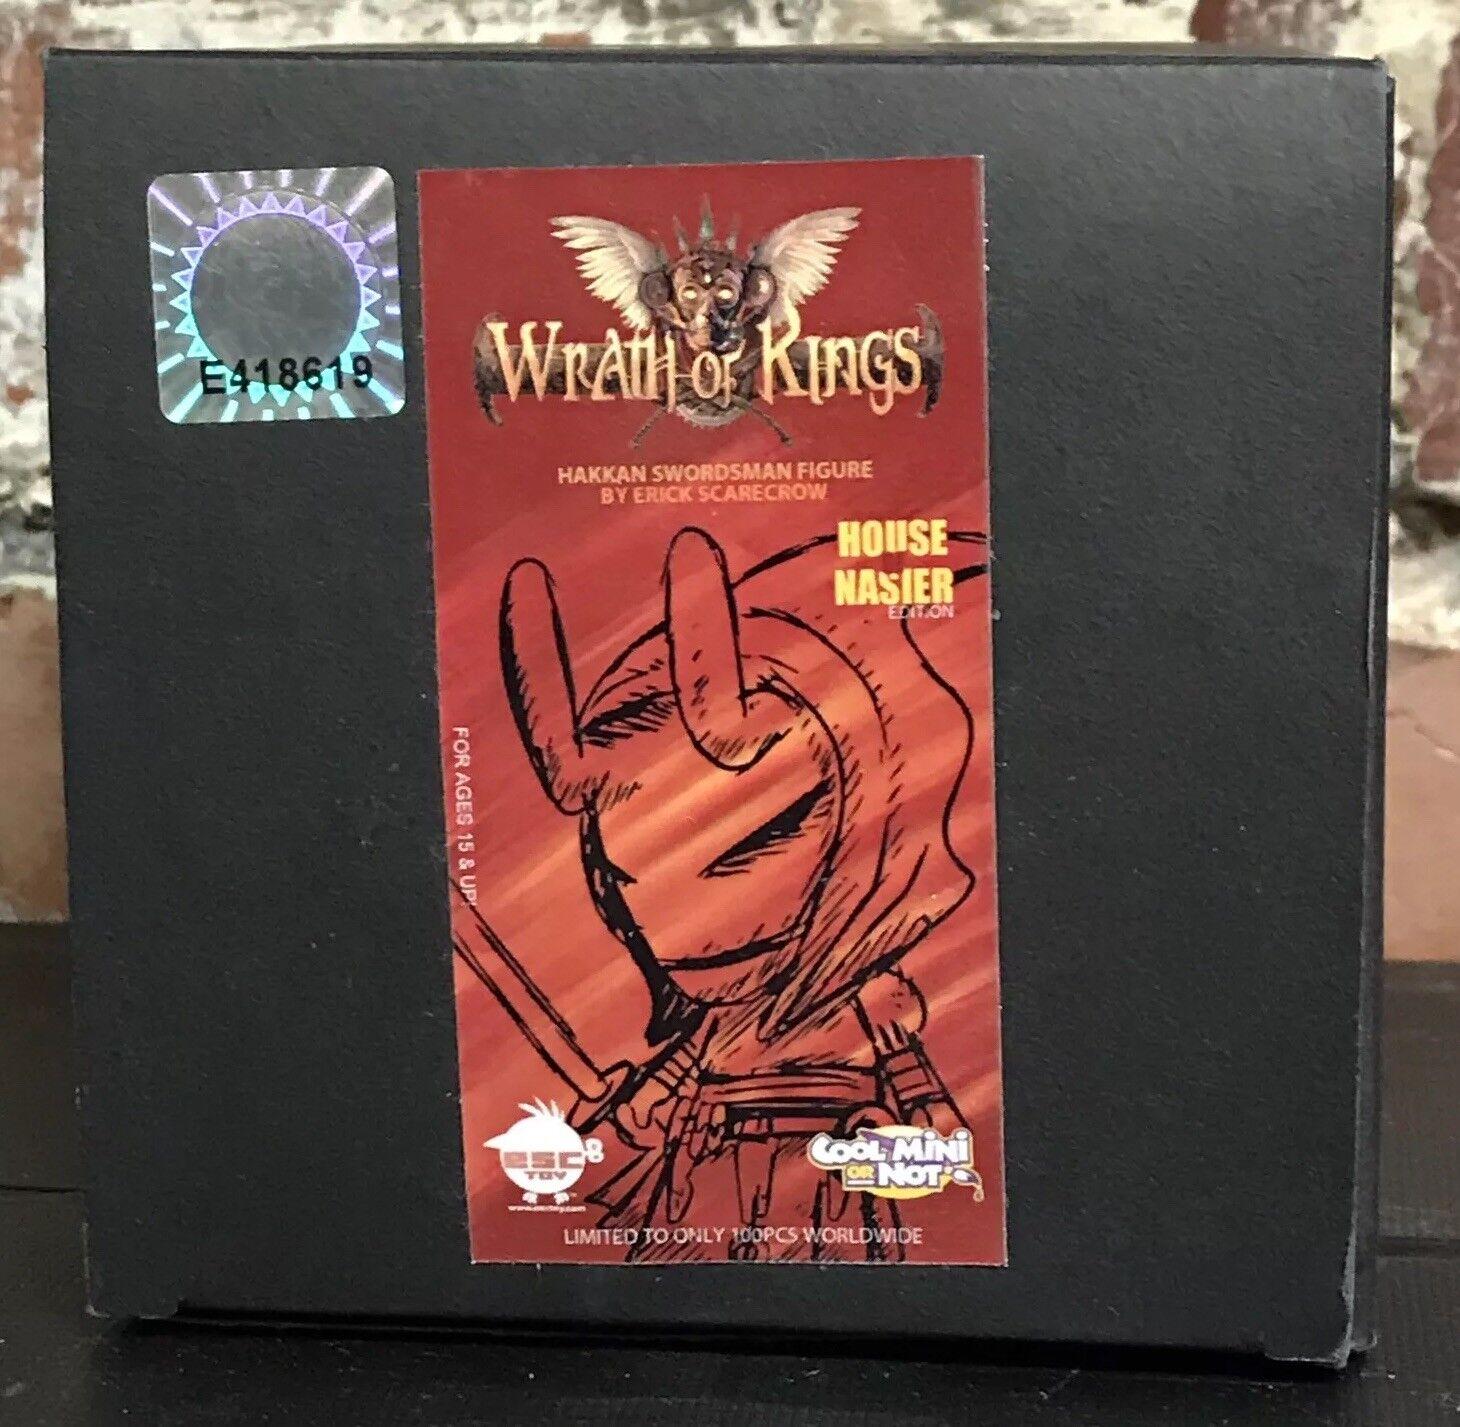 Wrath Of Kings Hakkan Swordsman Figure Scarecrow 100 Pieces House Nasier Edition